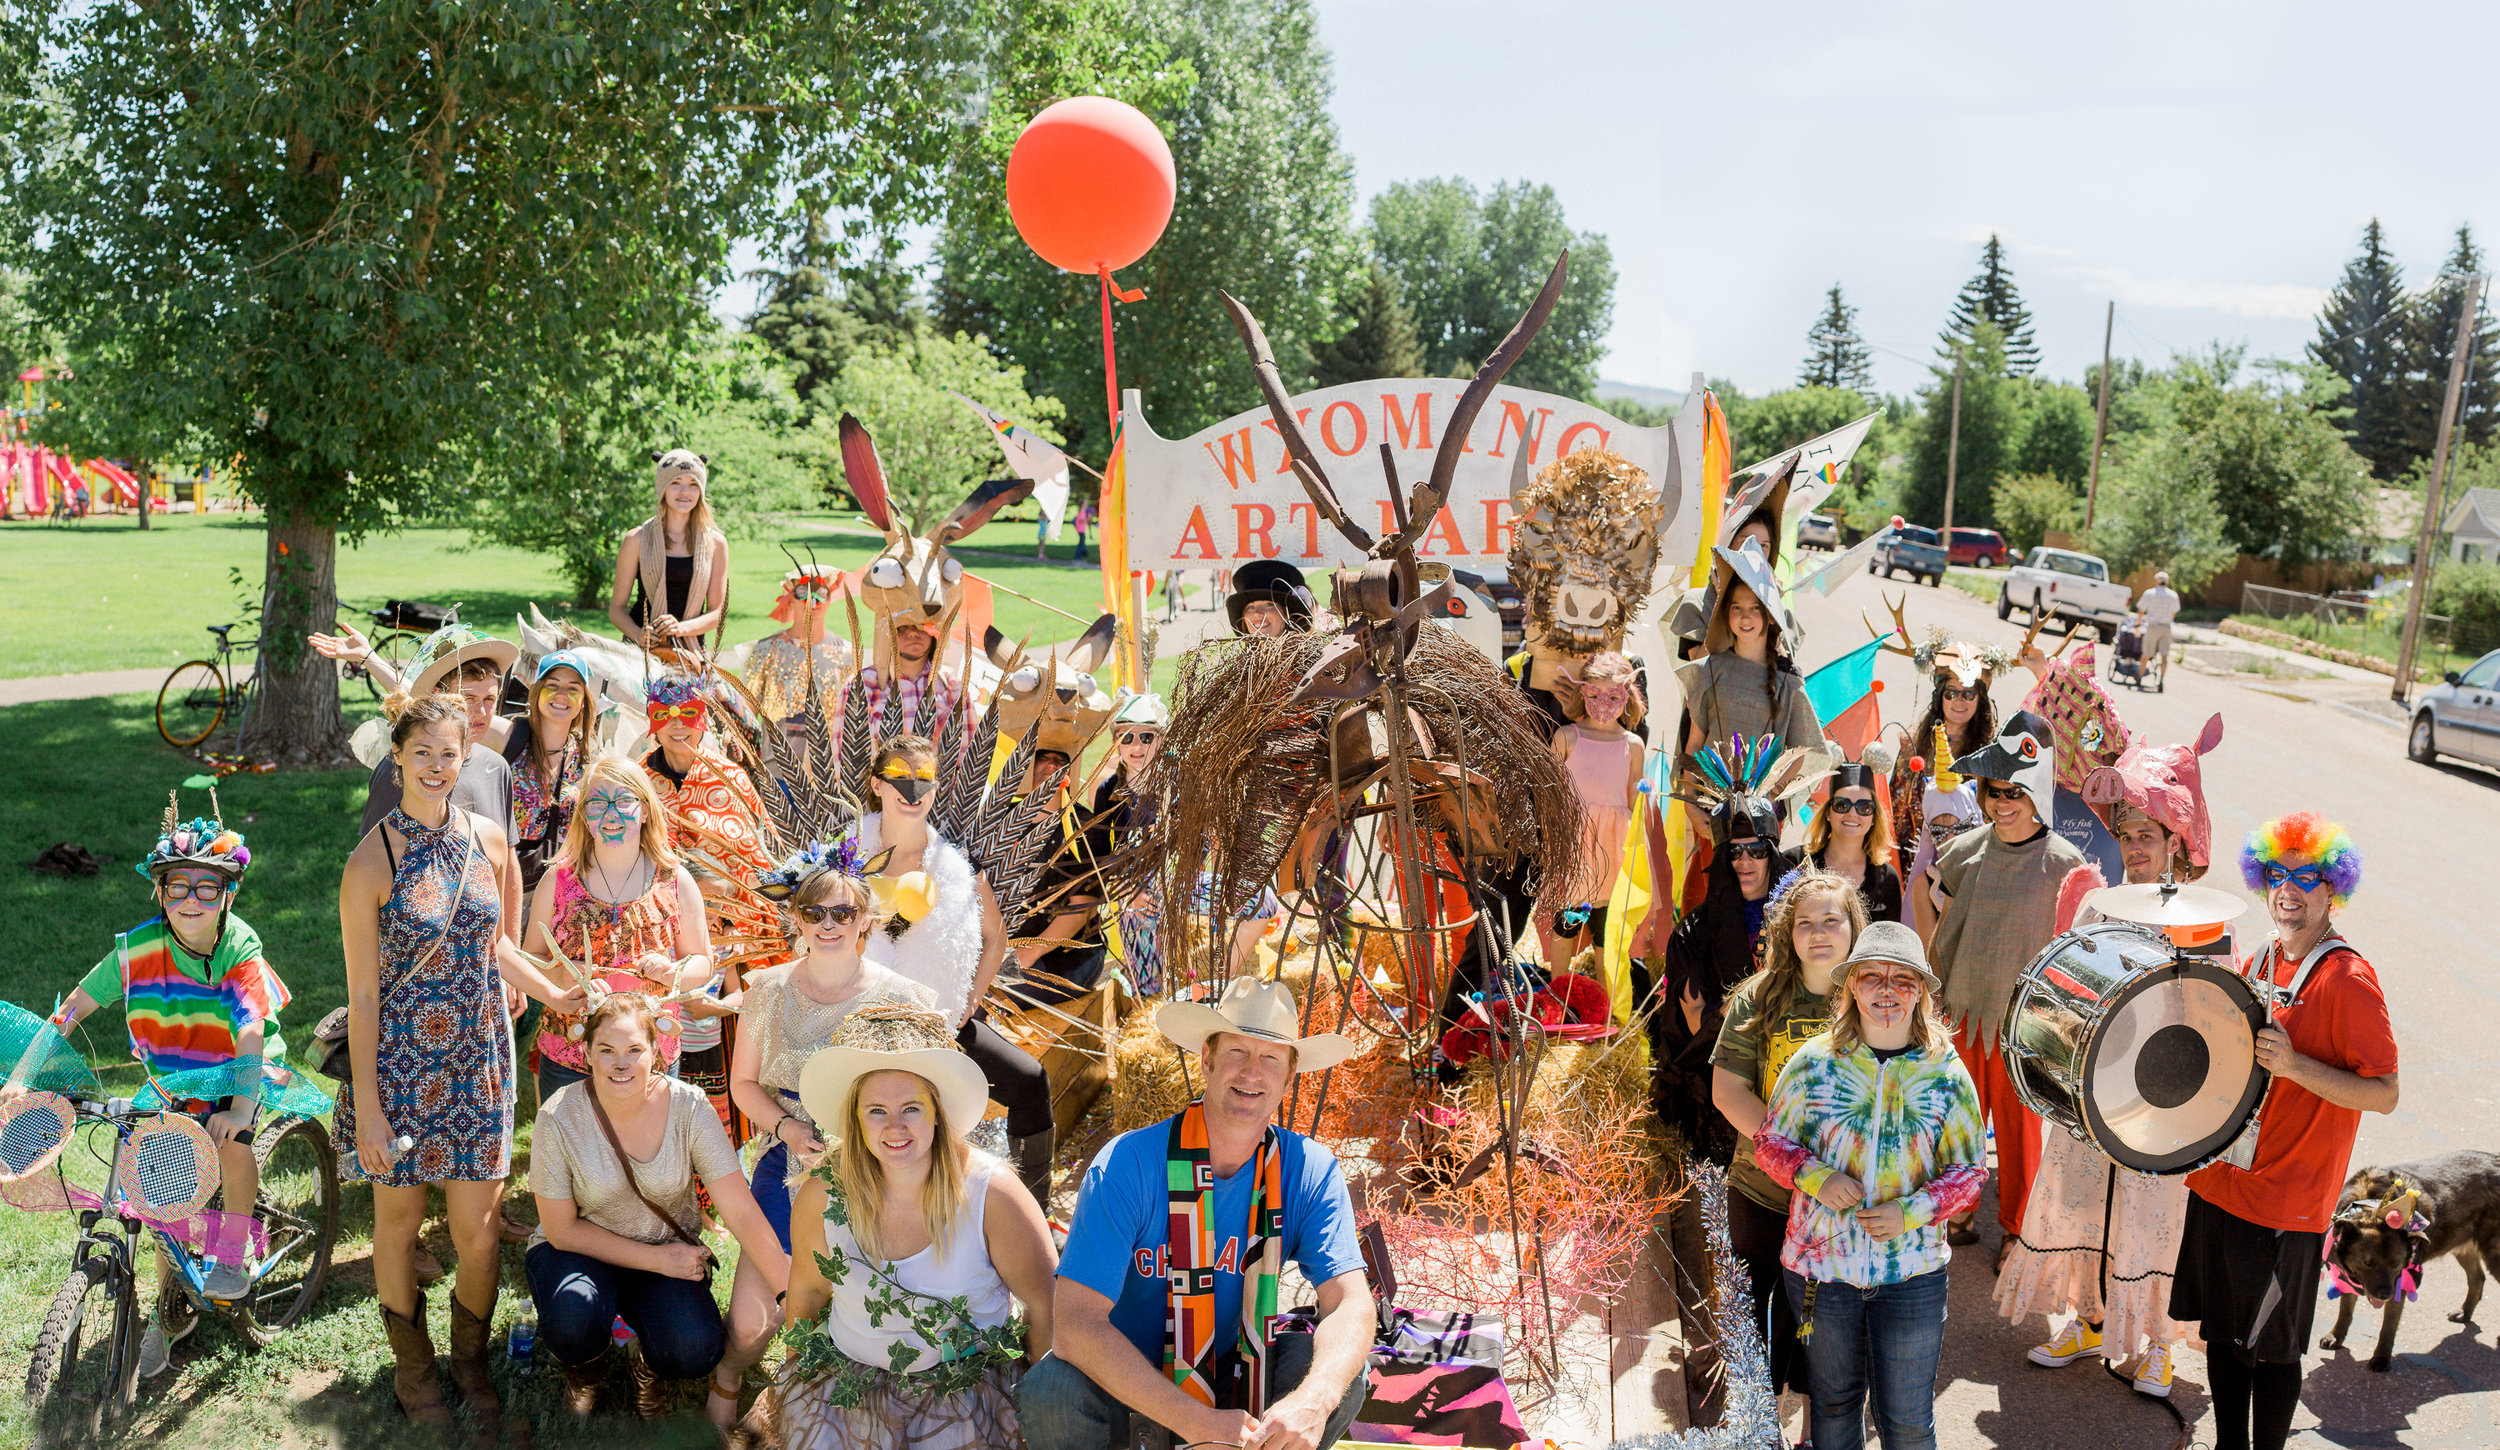 Wyoming Art Party - Parade 2016-81.jpg